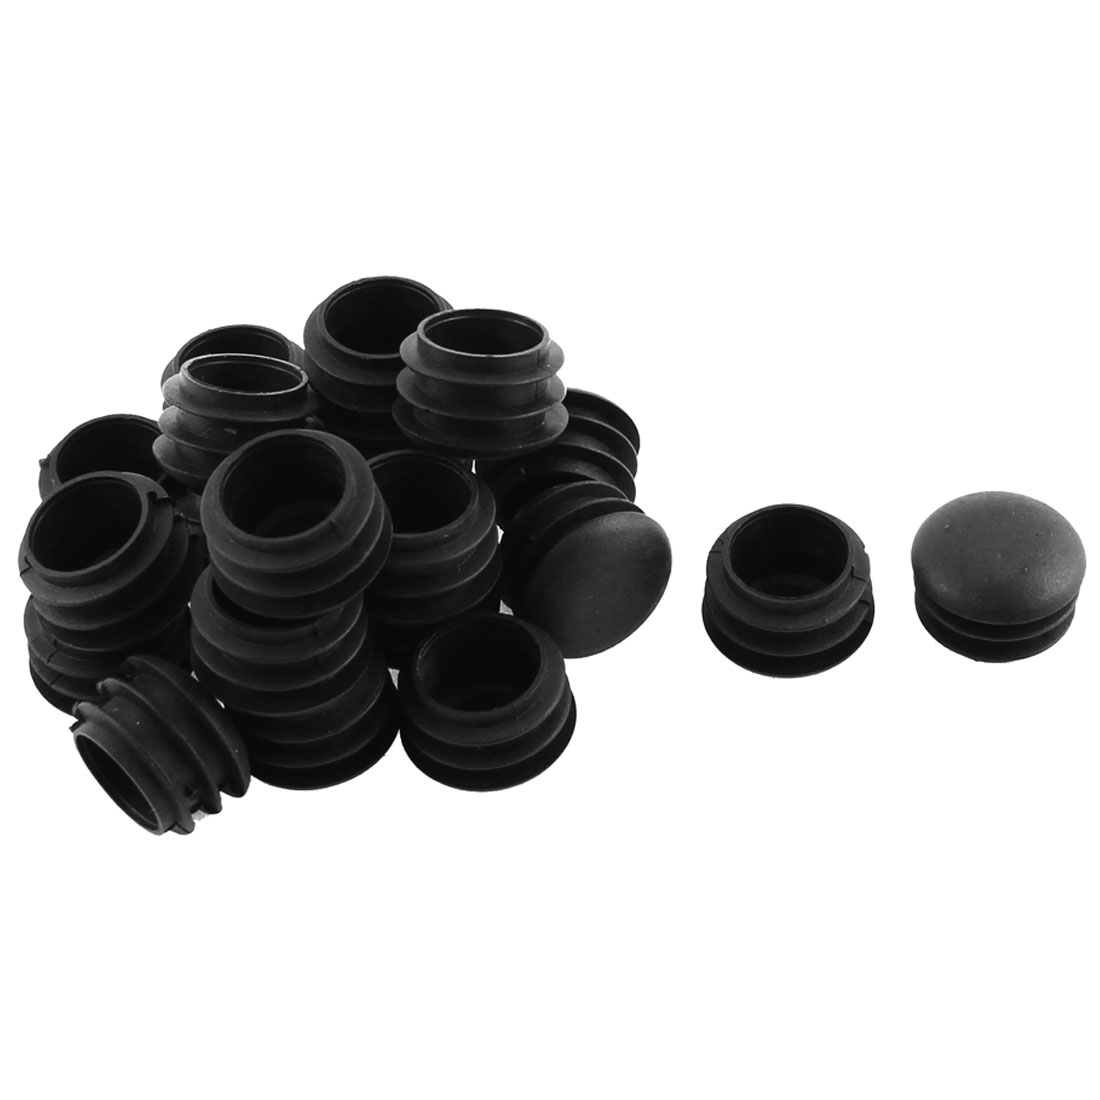 Furniture Plastic Blanking End Tube Caps Cover Inserts 25mm Dia 20pcs